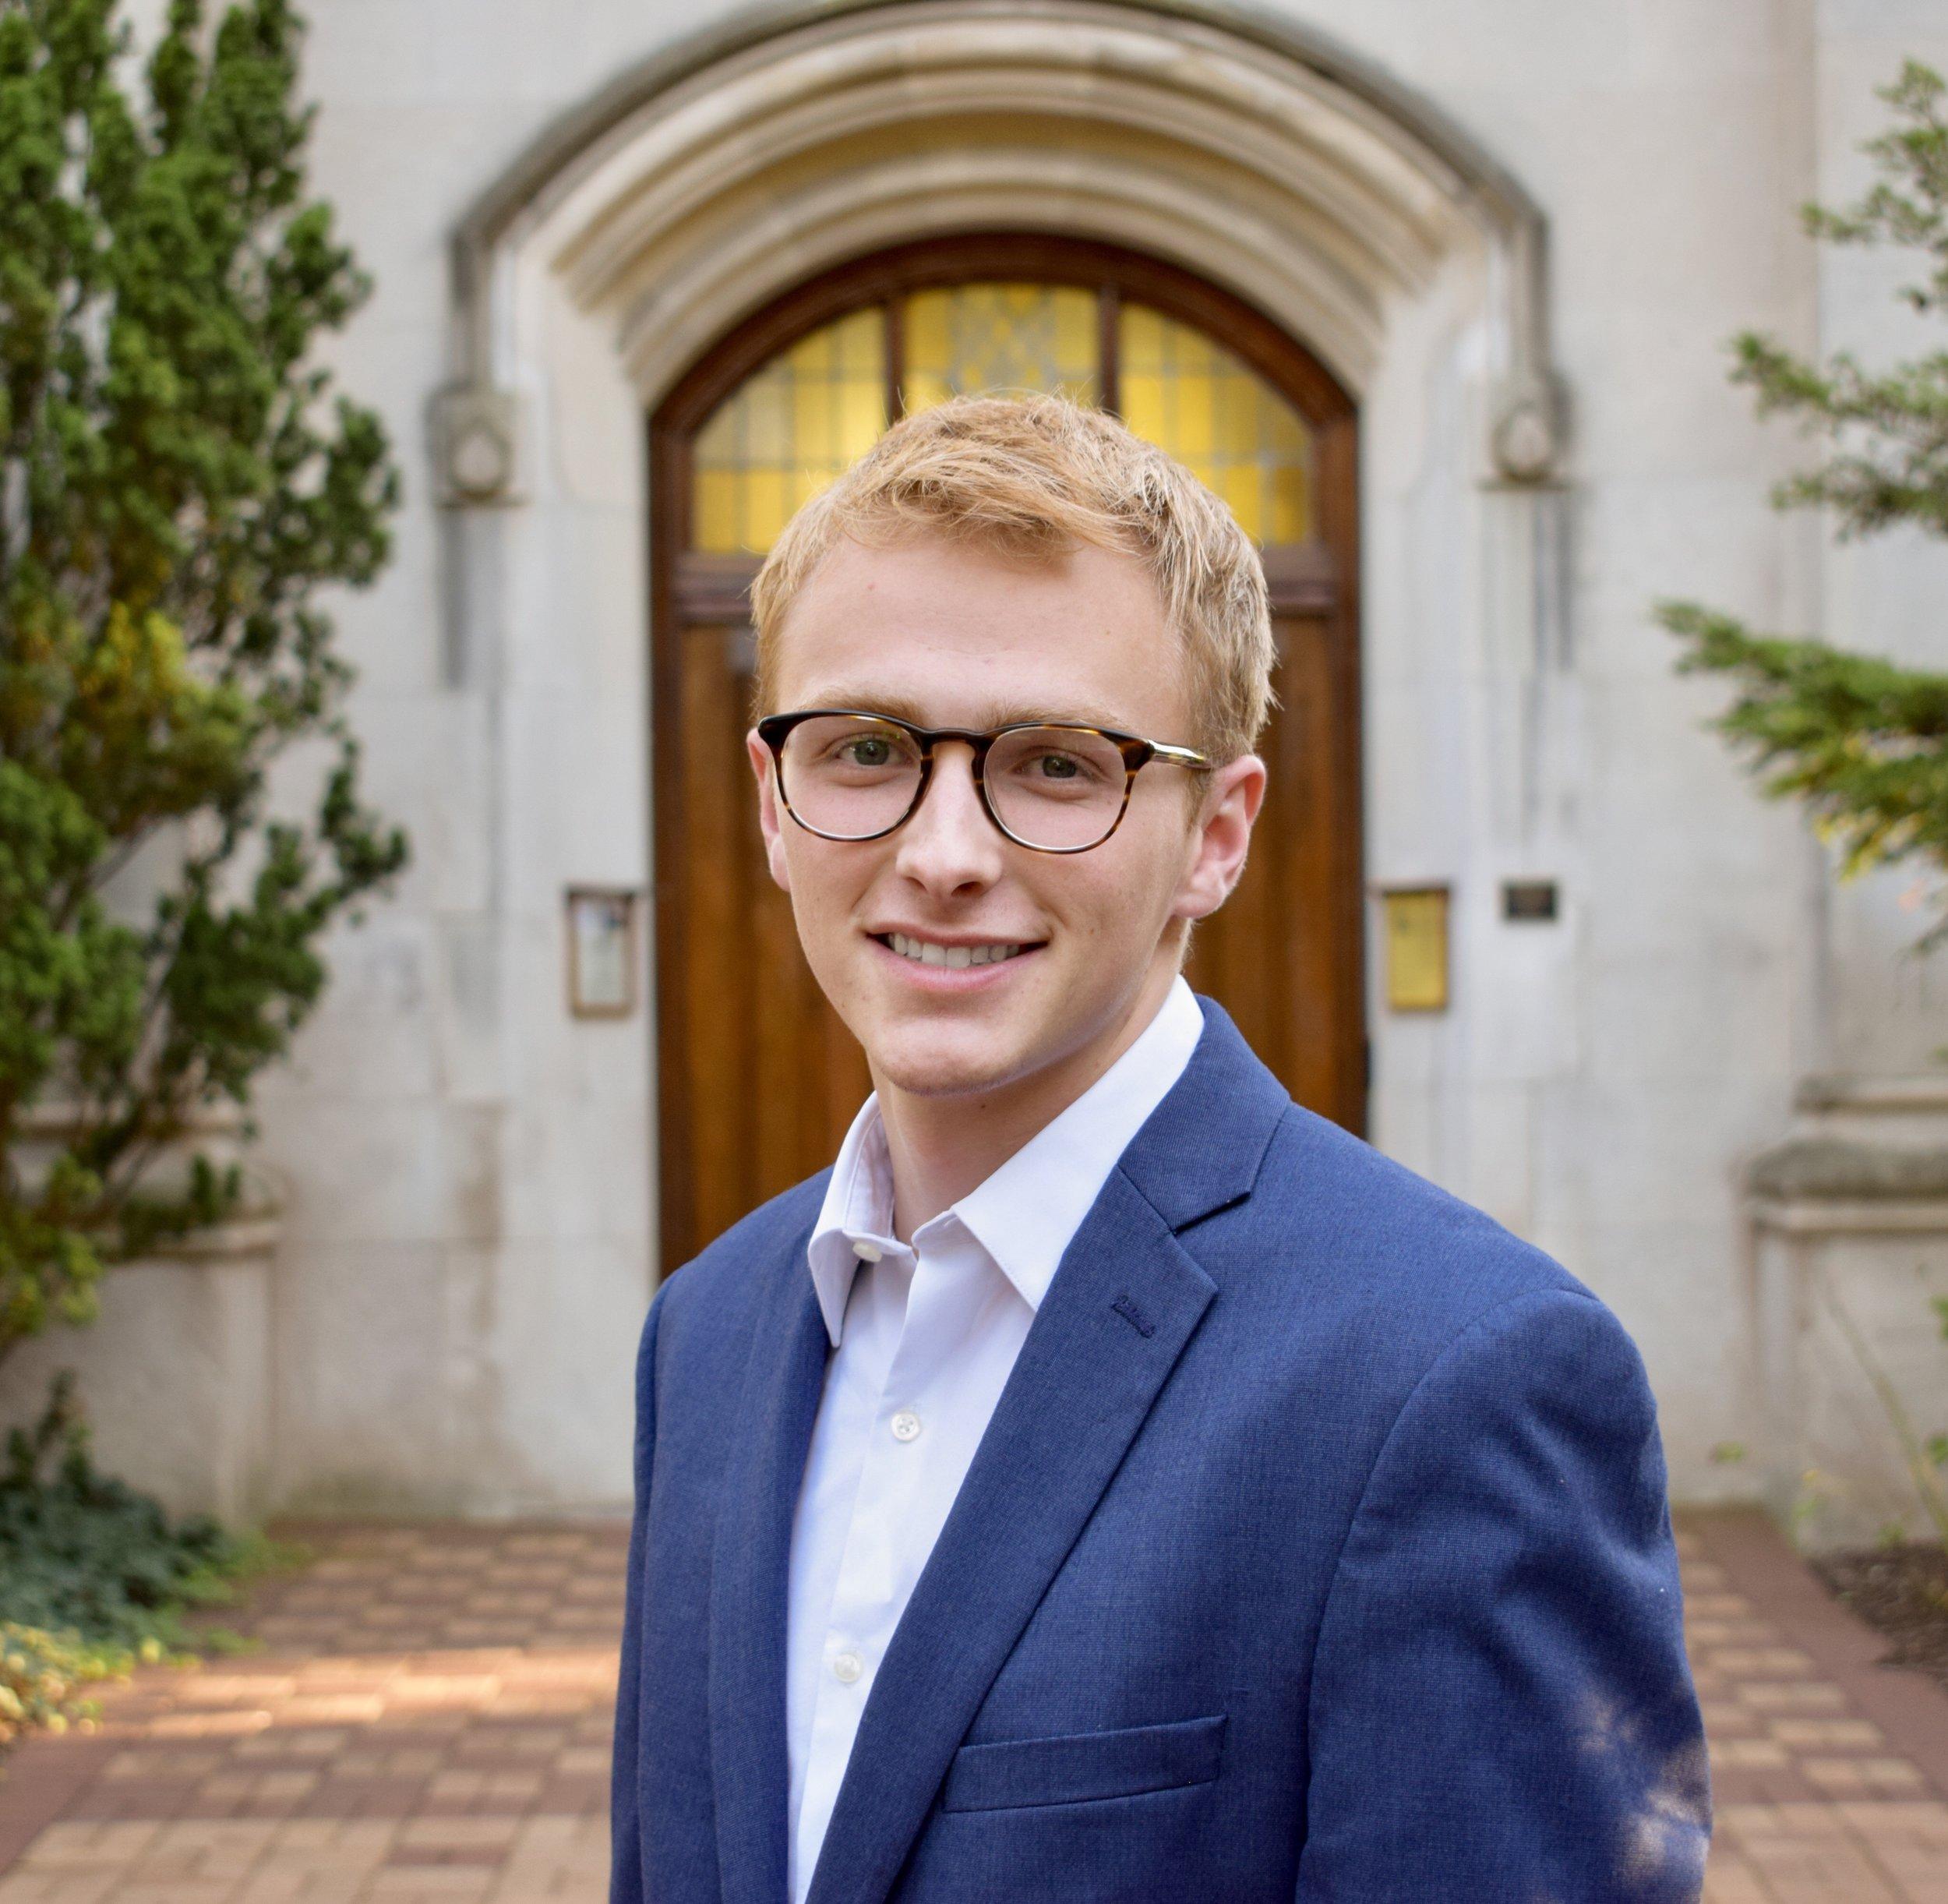 Jacob Cendrowski - Business Analyst